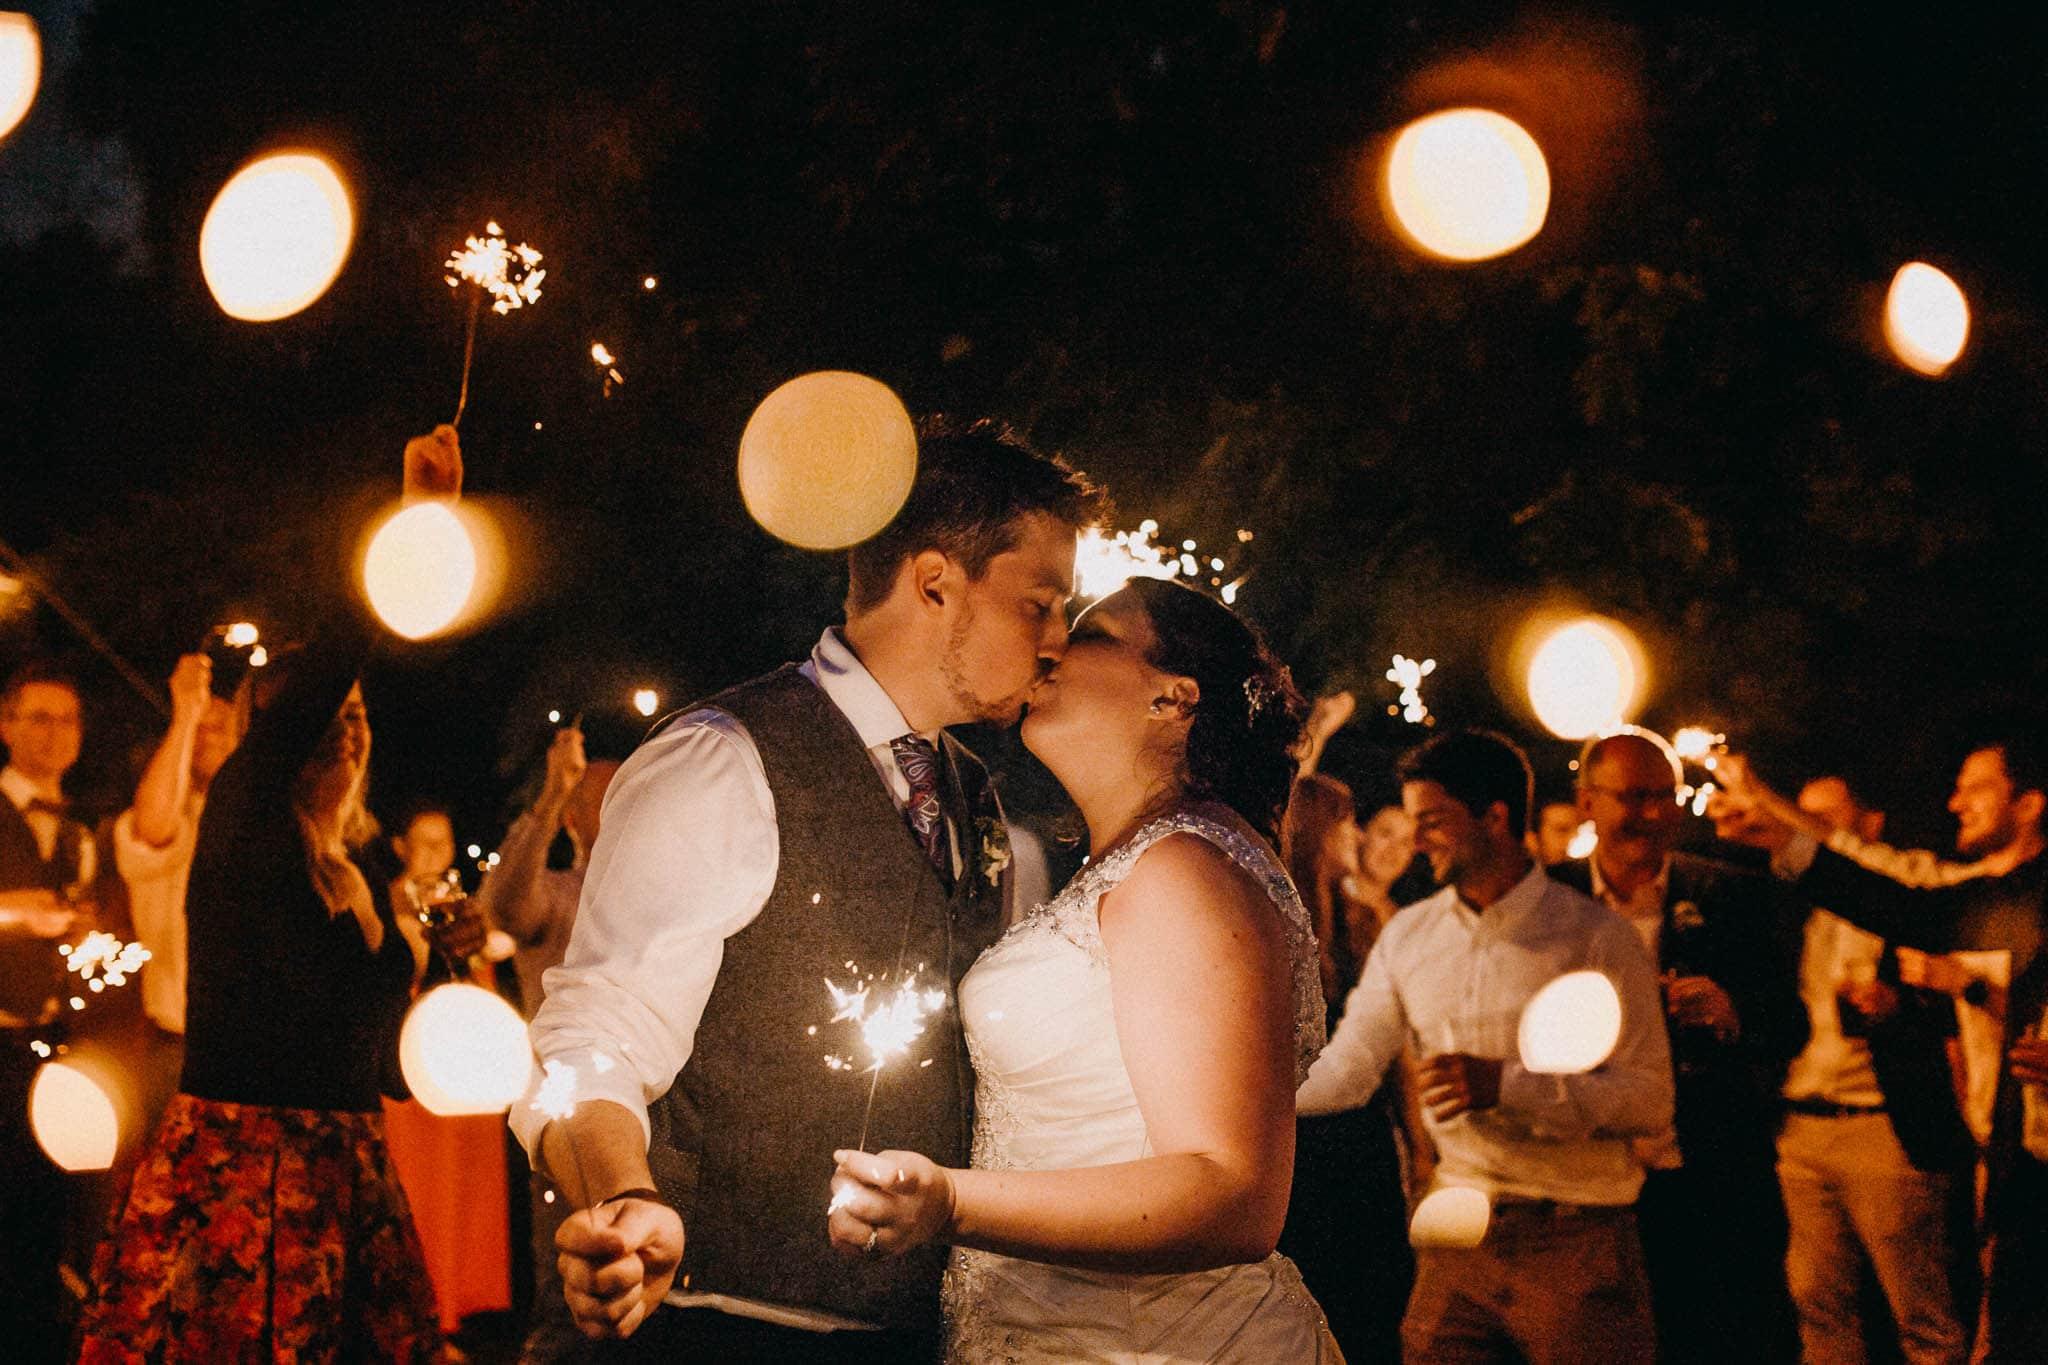 Wedding photographer Kent - C & G 4